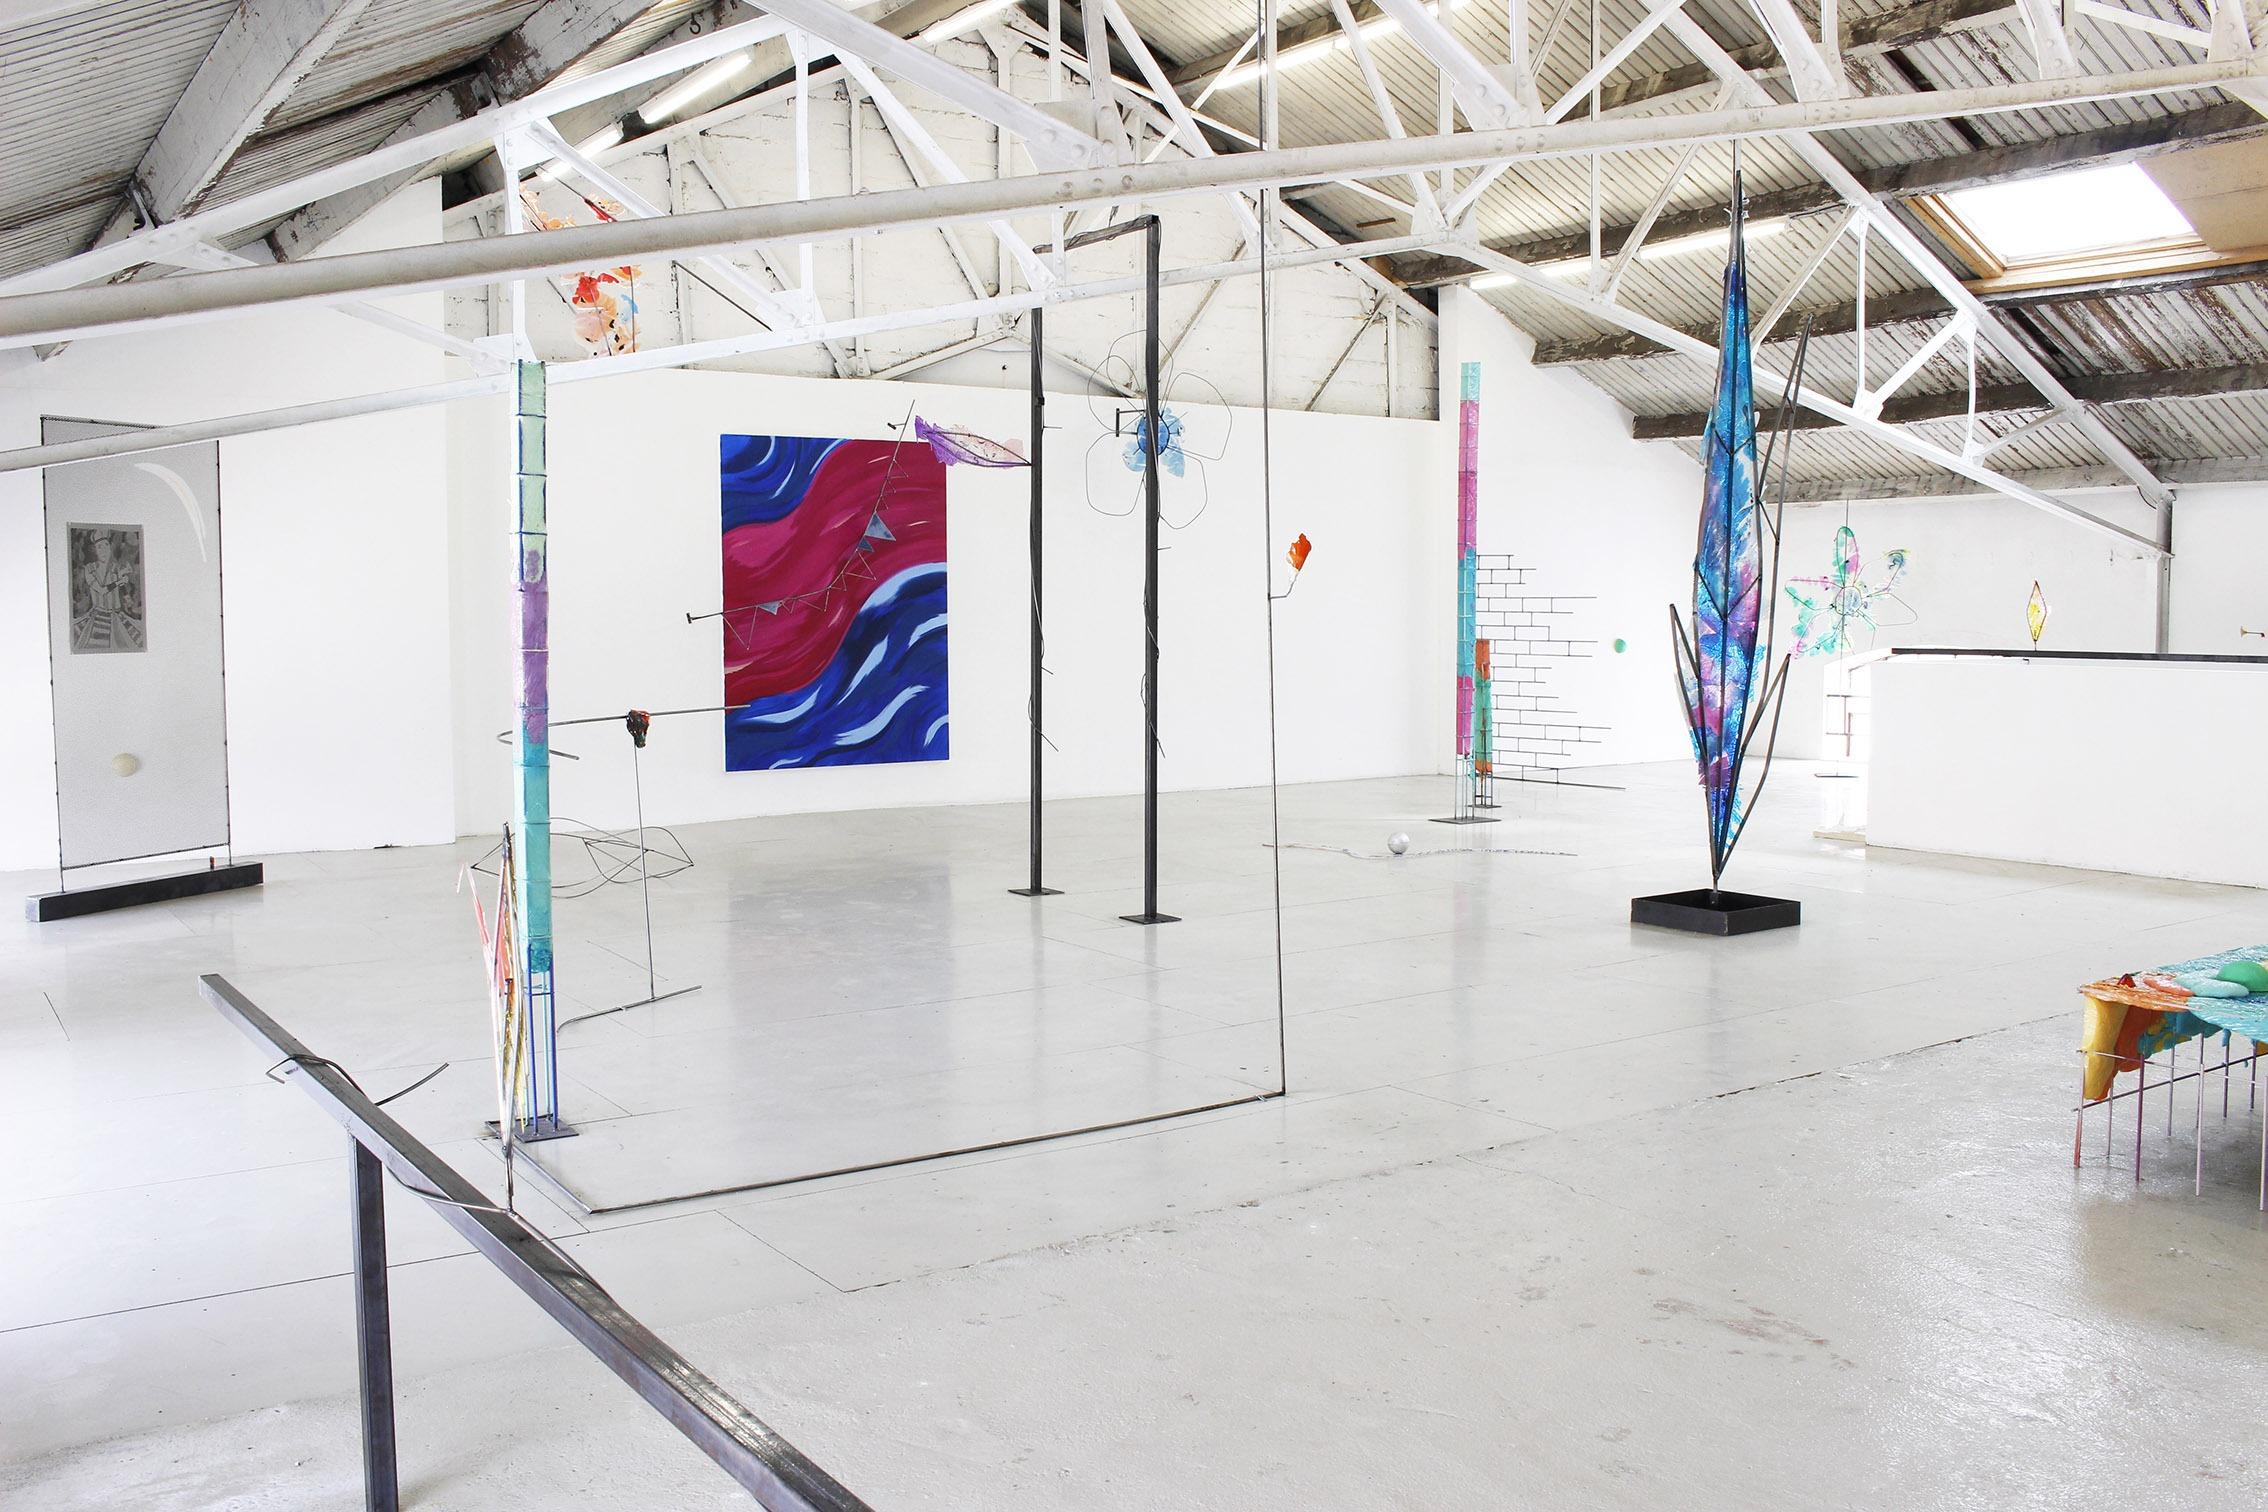 Romain Vicari - NEW WORLD - Les Ateliers Vortex